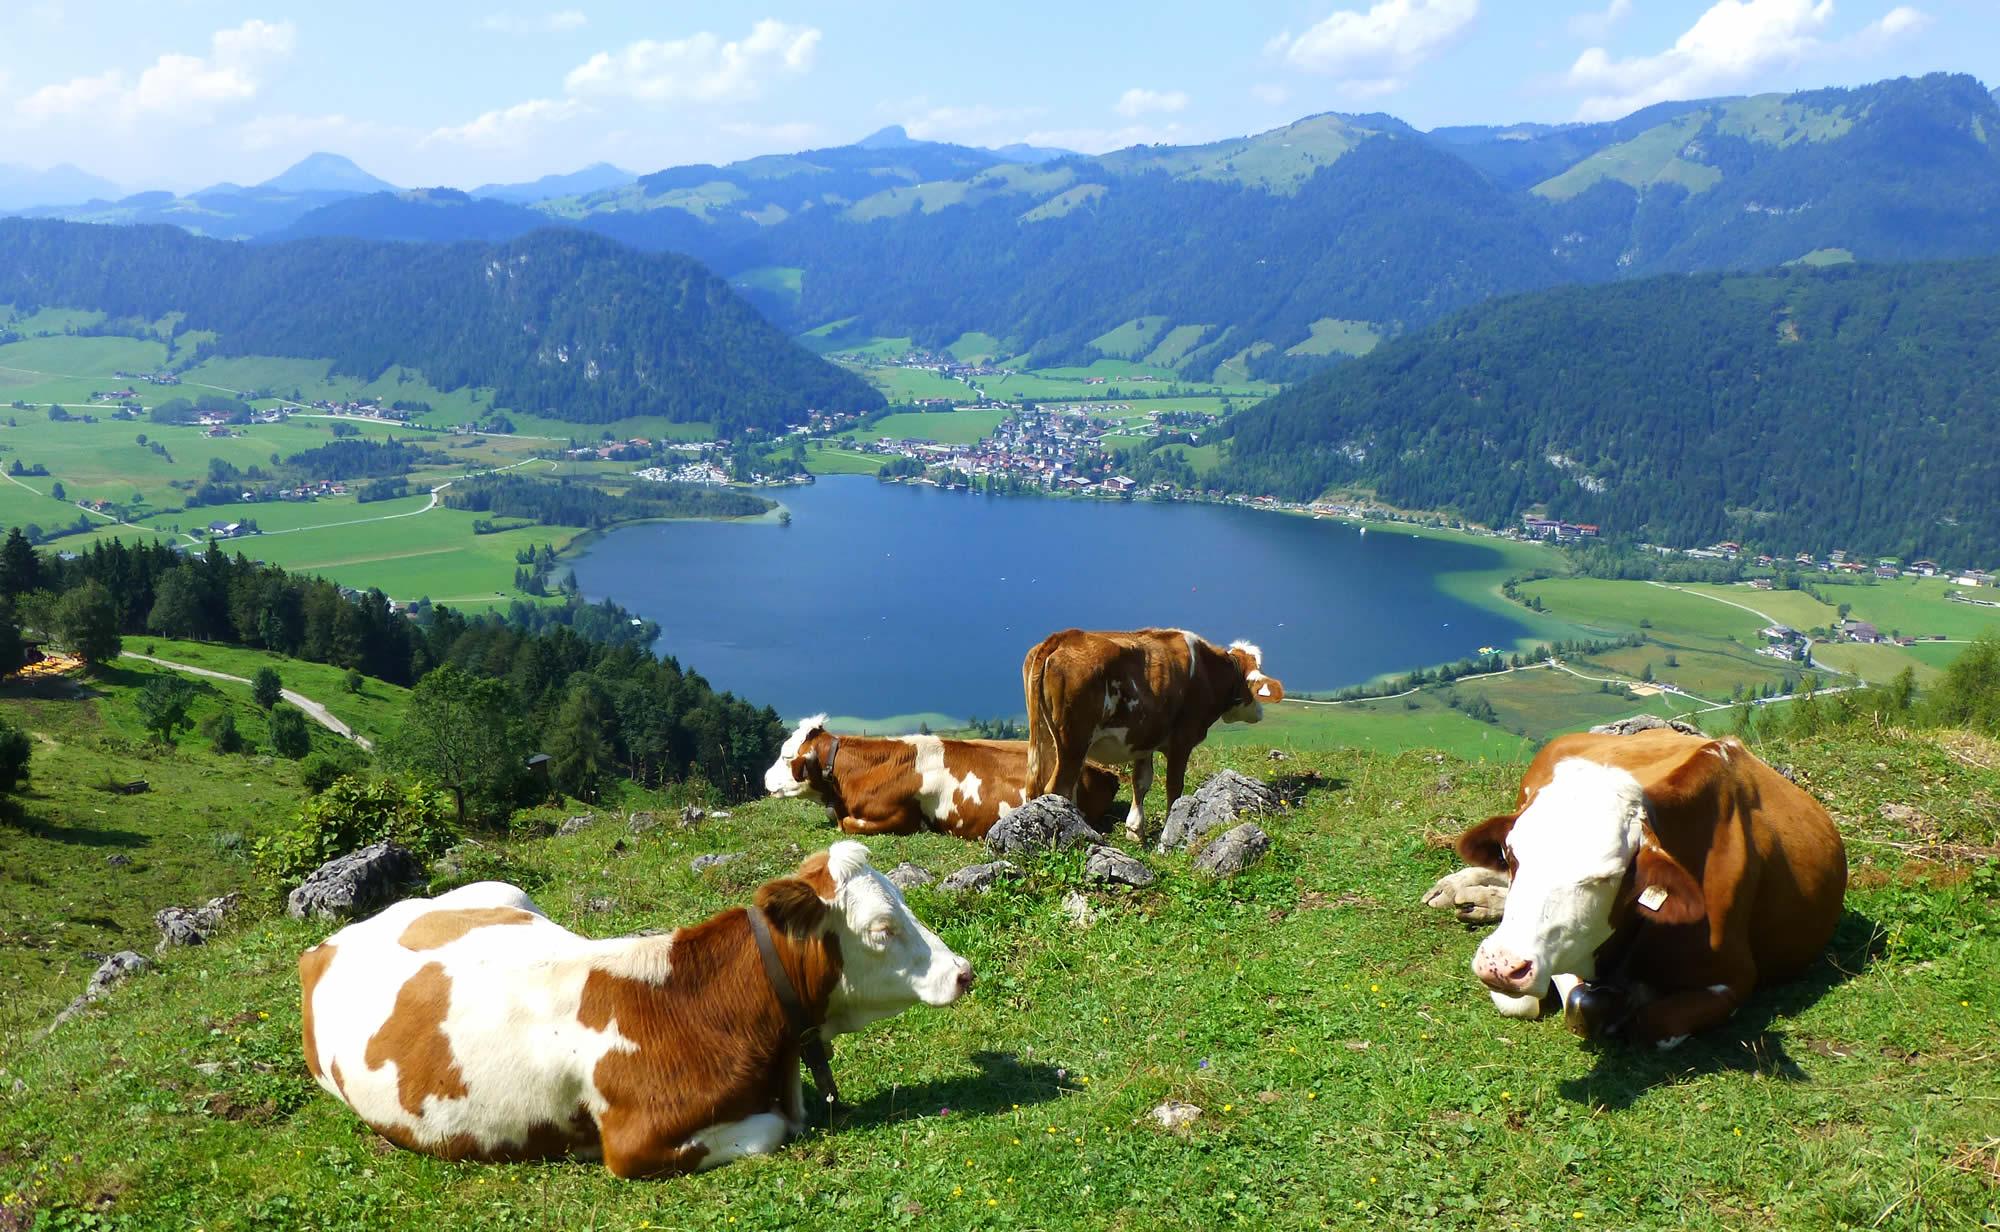 Wandern im Tiroler Kaiserwinkl